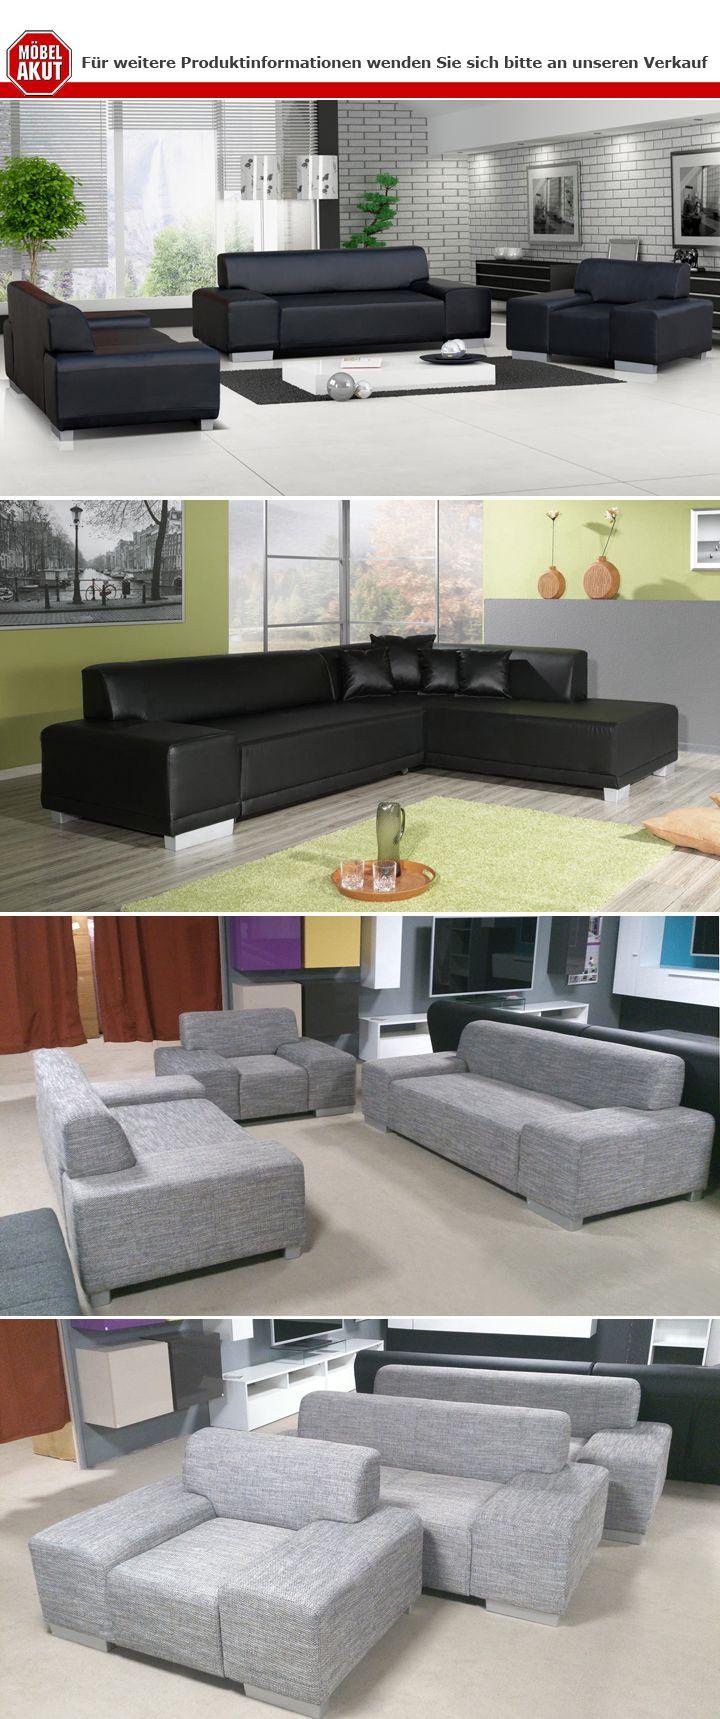 sofa peter 2 sitzer wohnzimmer couch in lederlook schwarz mit f en in aluoptik ebay. Black Bedroom Furniture Sets. Home Design Ideas